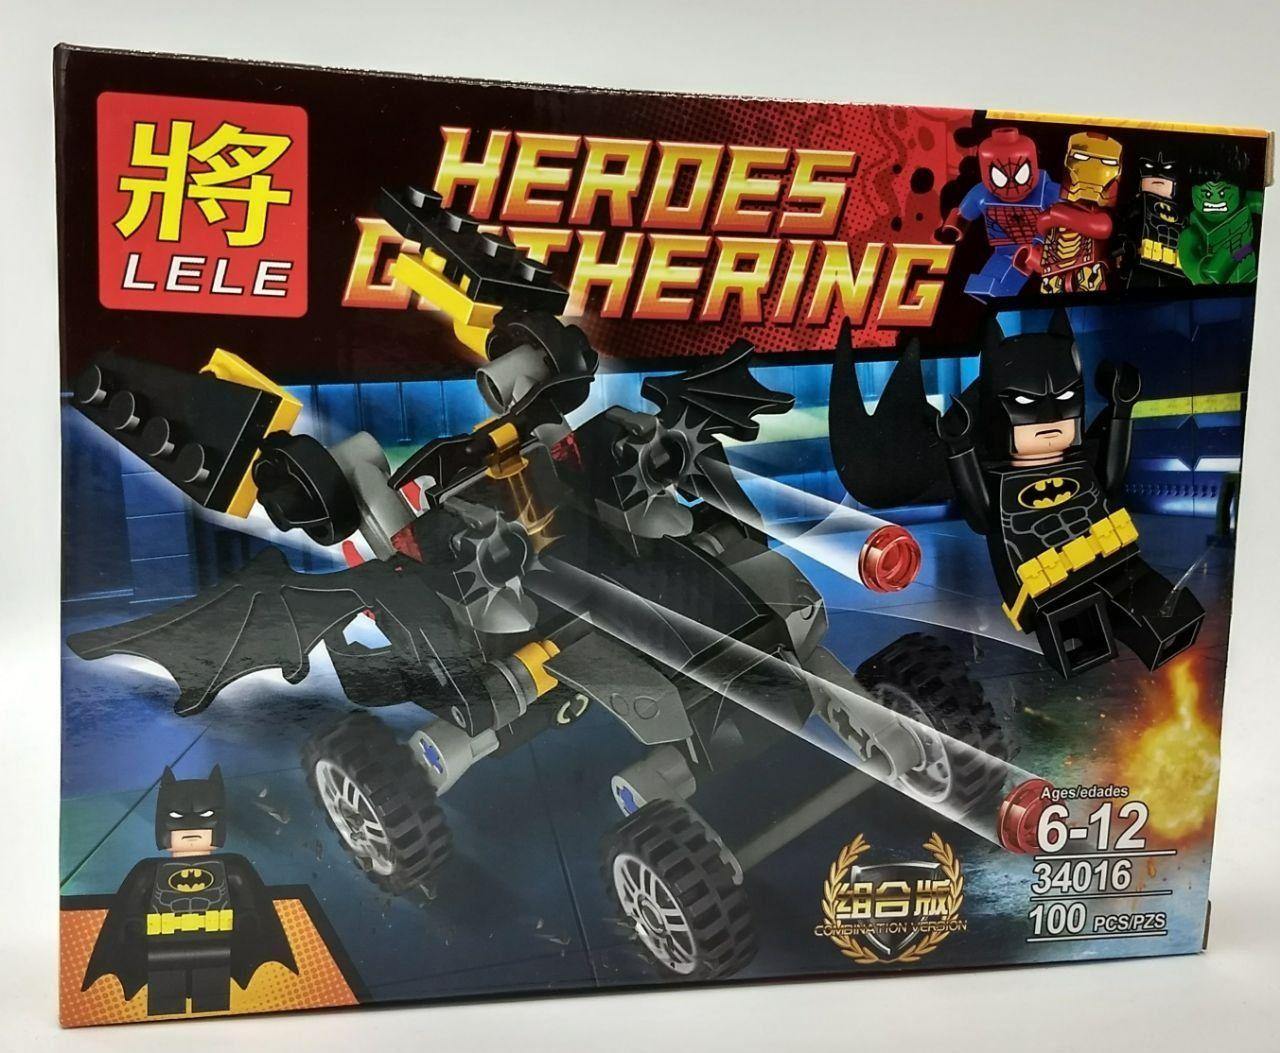 Bloco de Montar - Heroes Gathering - Super-herói Homem Morcego 100 pçs